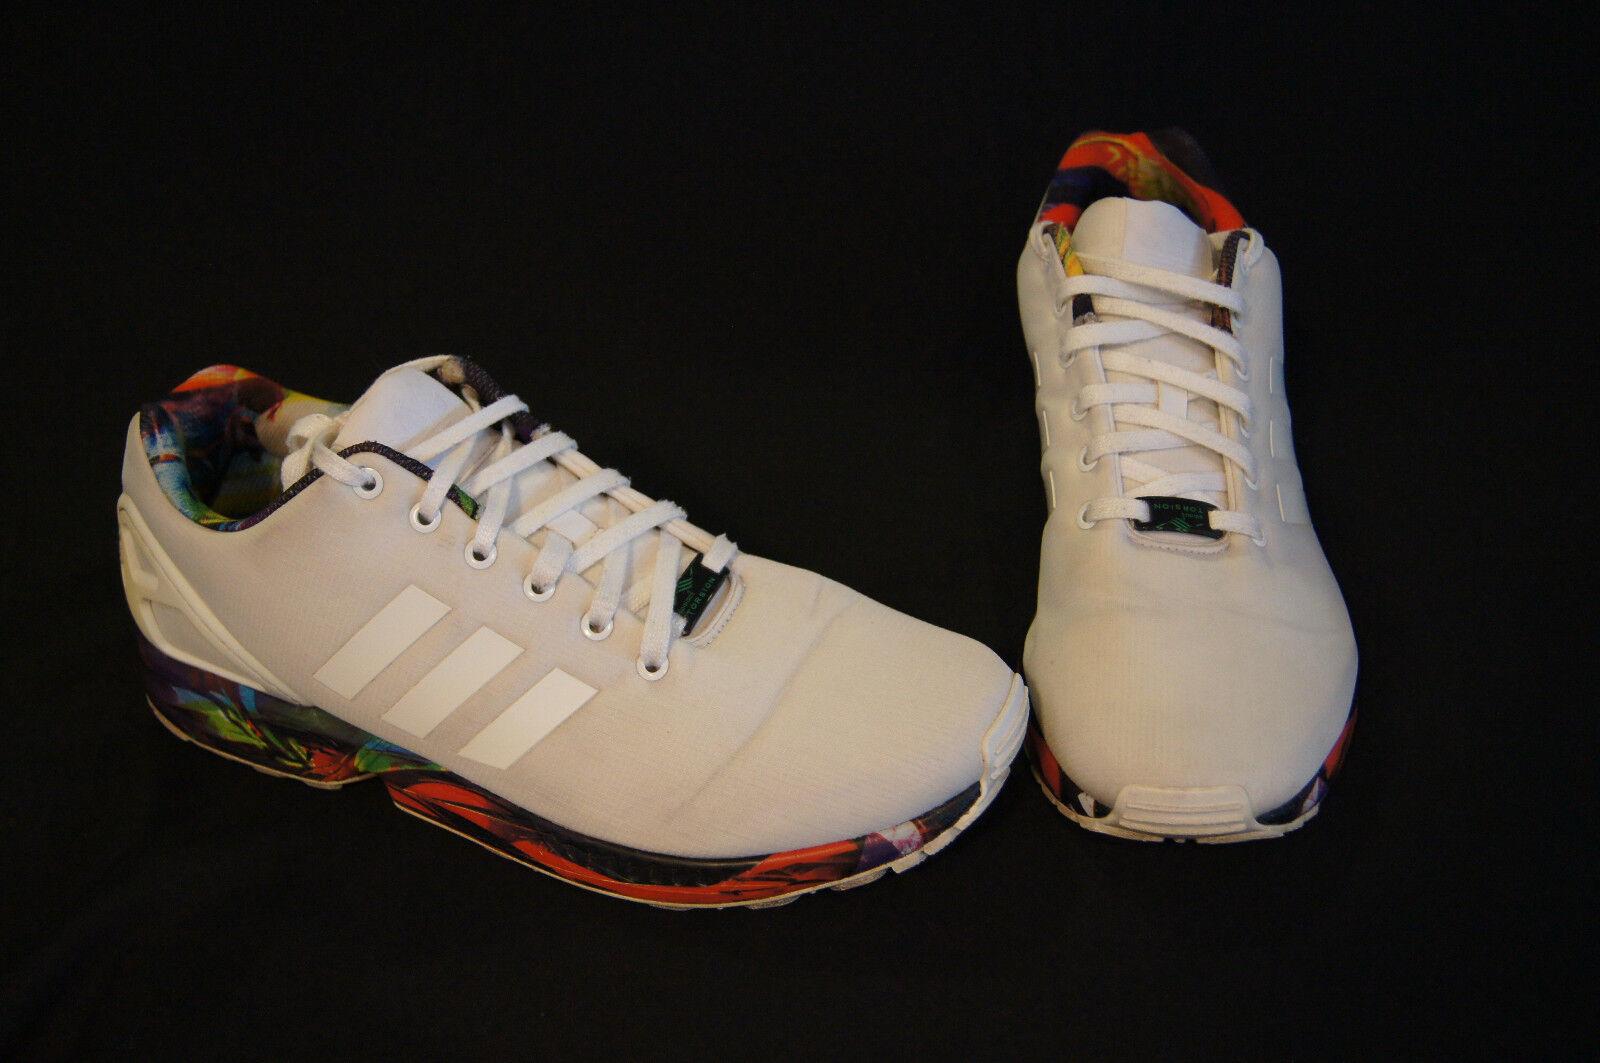 dcf0fcda8dc Adidas Torsion ZX Flex Mens size 13 running shoes white black red blue green  white black red blue green white black red blue green 8516e5